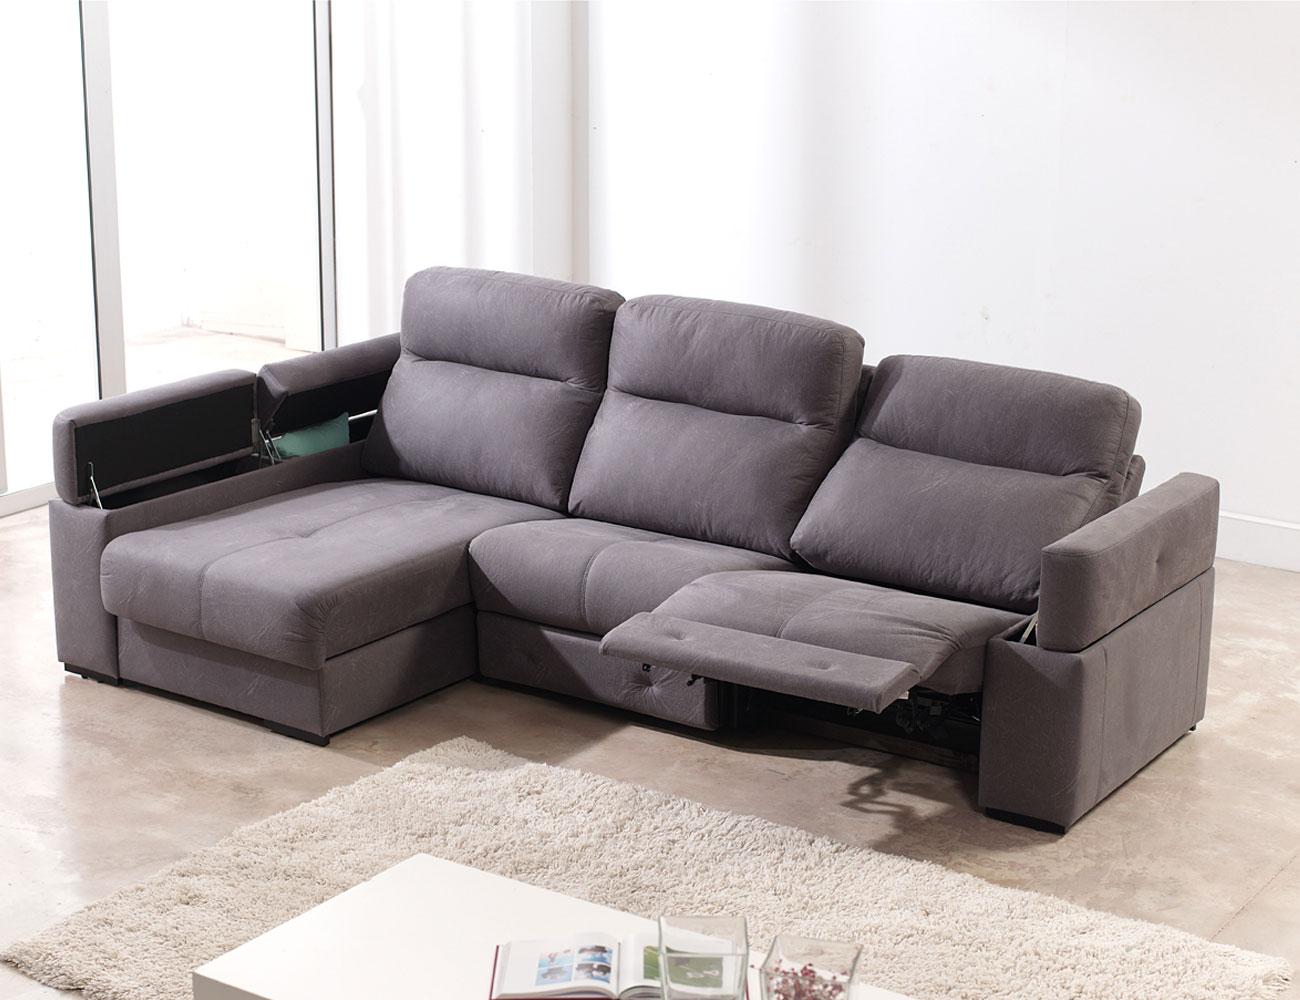 Sofa chaiselongue relax motor electrico 3 arcon 110